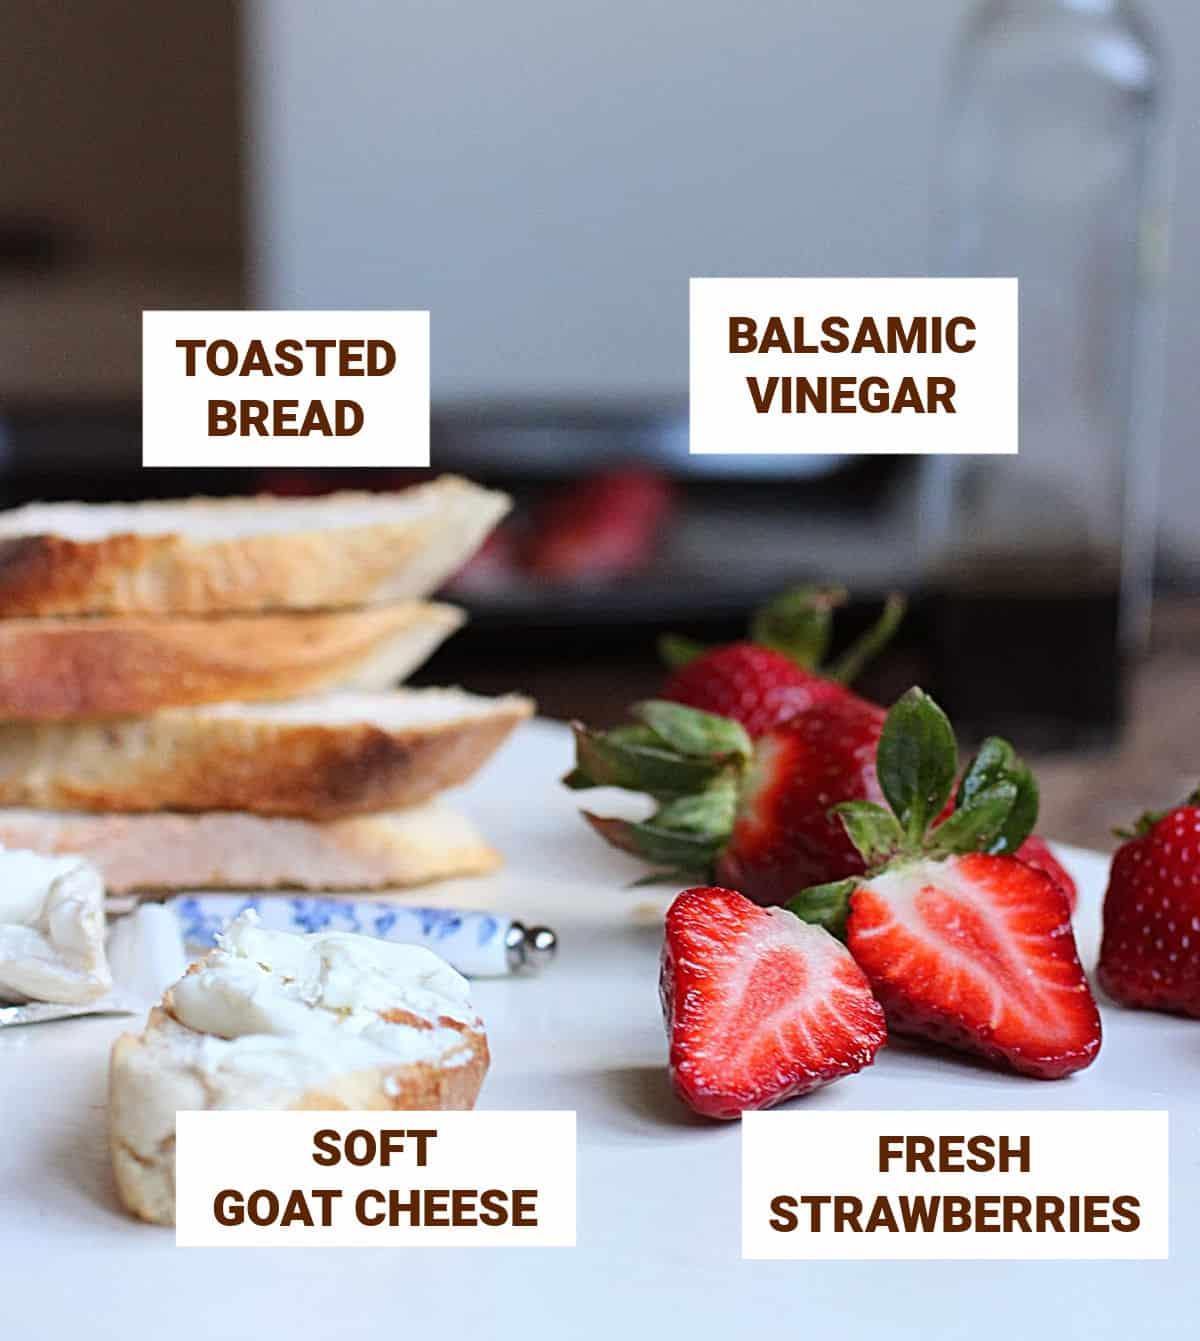 Strawberries, bread slices, vinegar bottle, cheese, knife on white table, text overlay